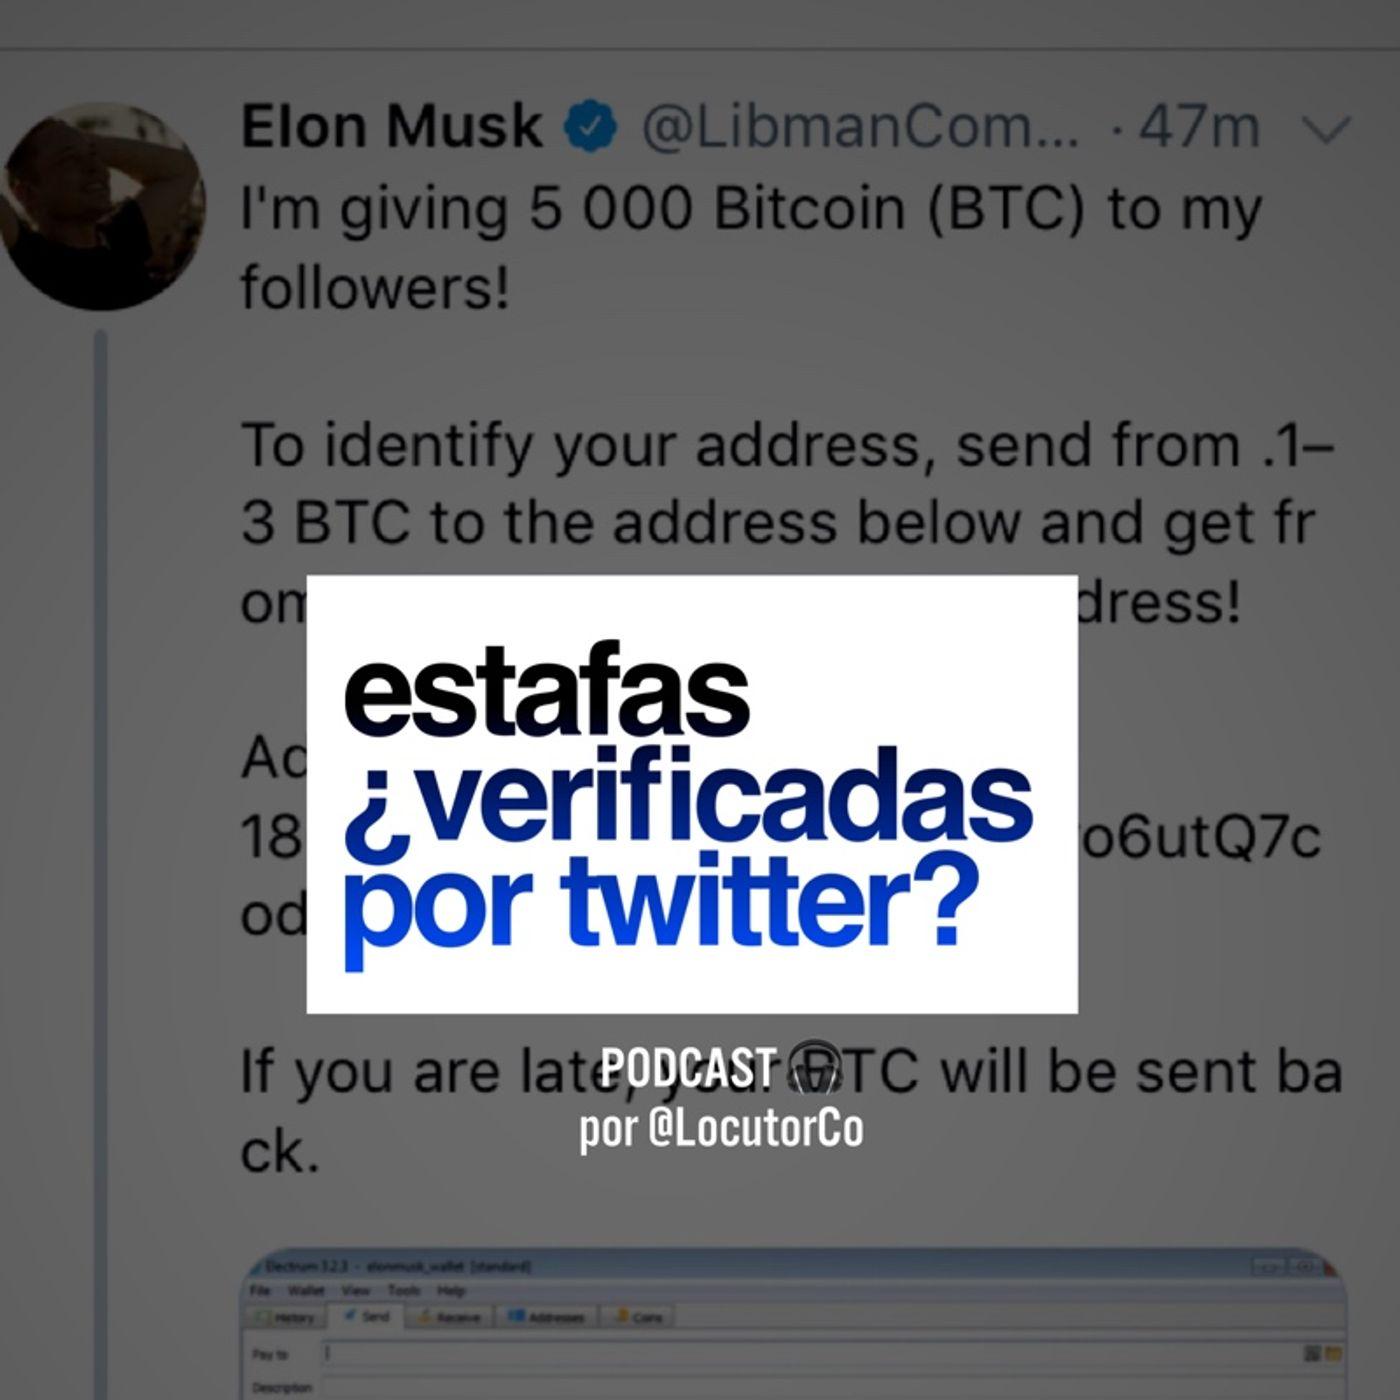 ¿Estafas Verificadas por Twitter?